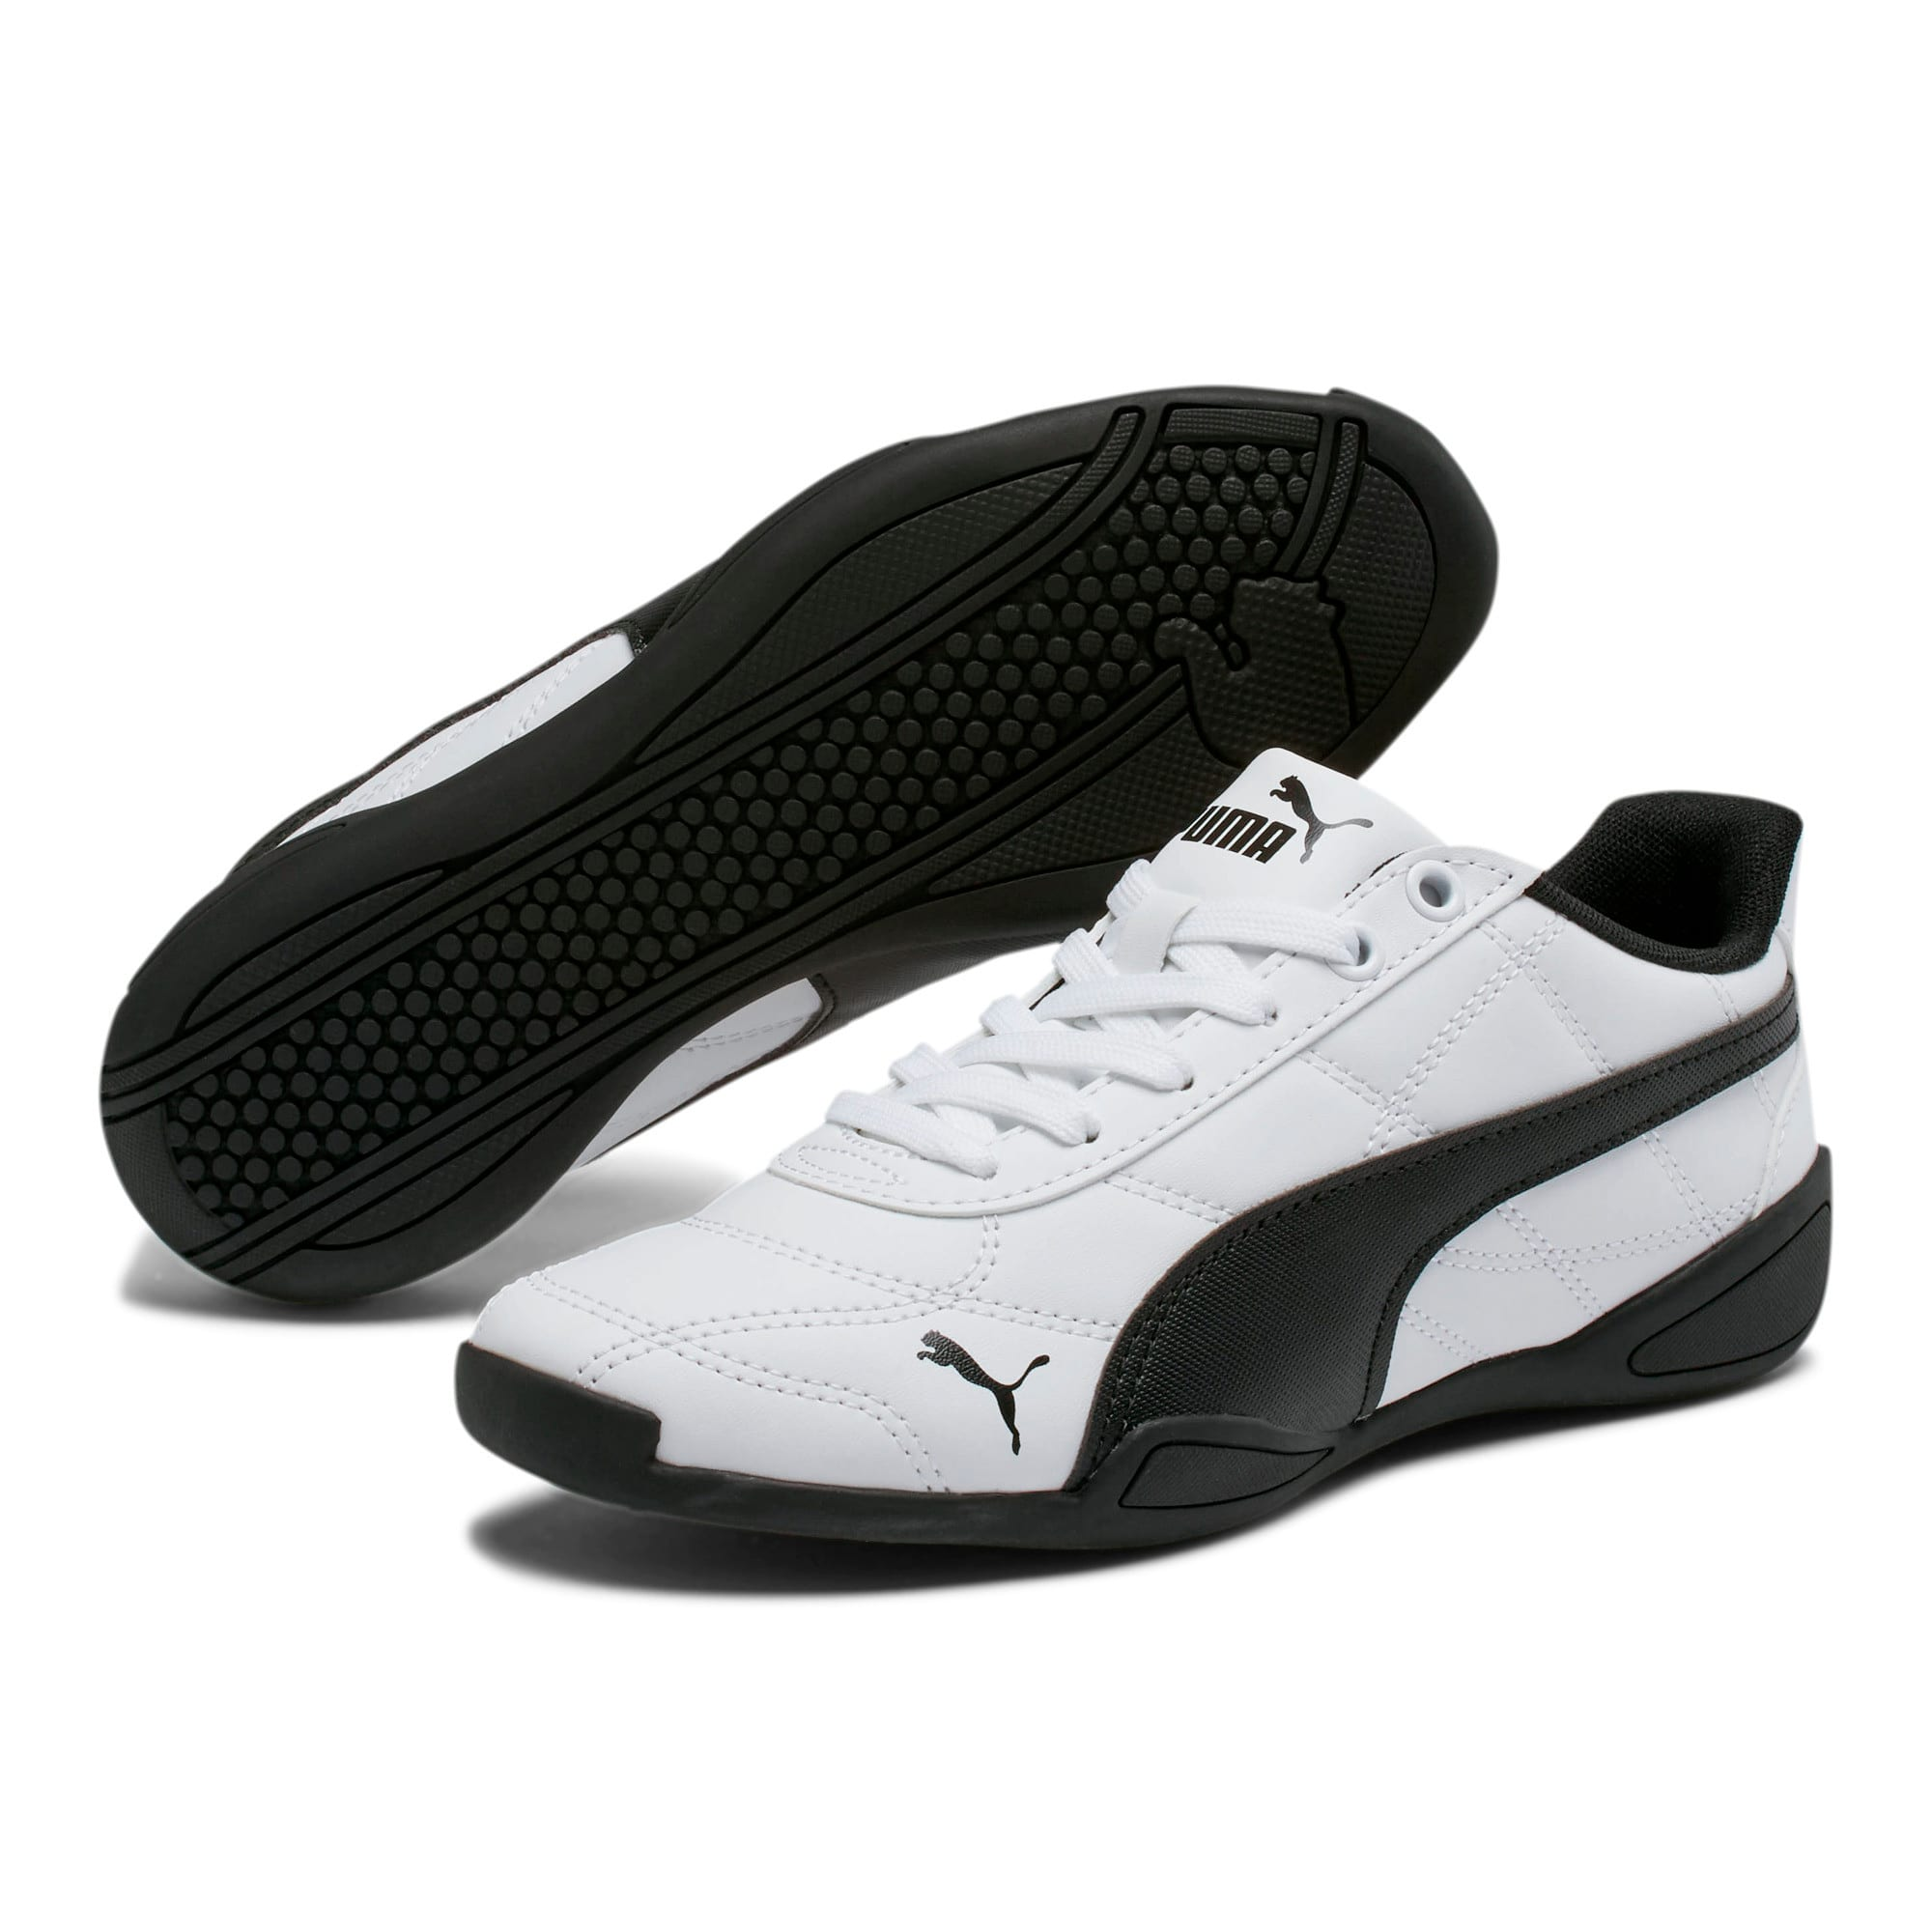 Thumbnail 2 of Tune Cat 3 Shoes JR, Puma White-Puma Black, medium